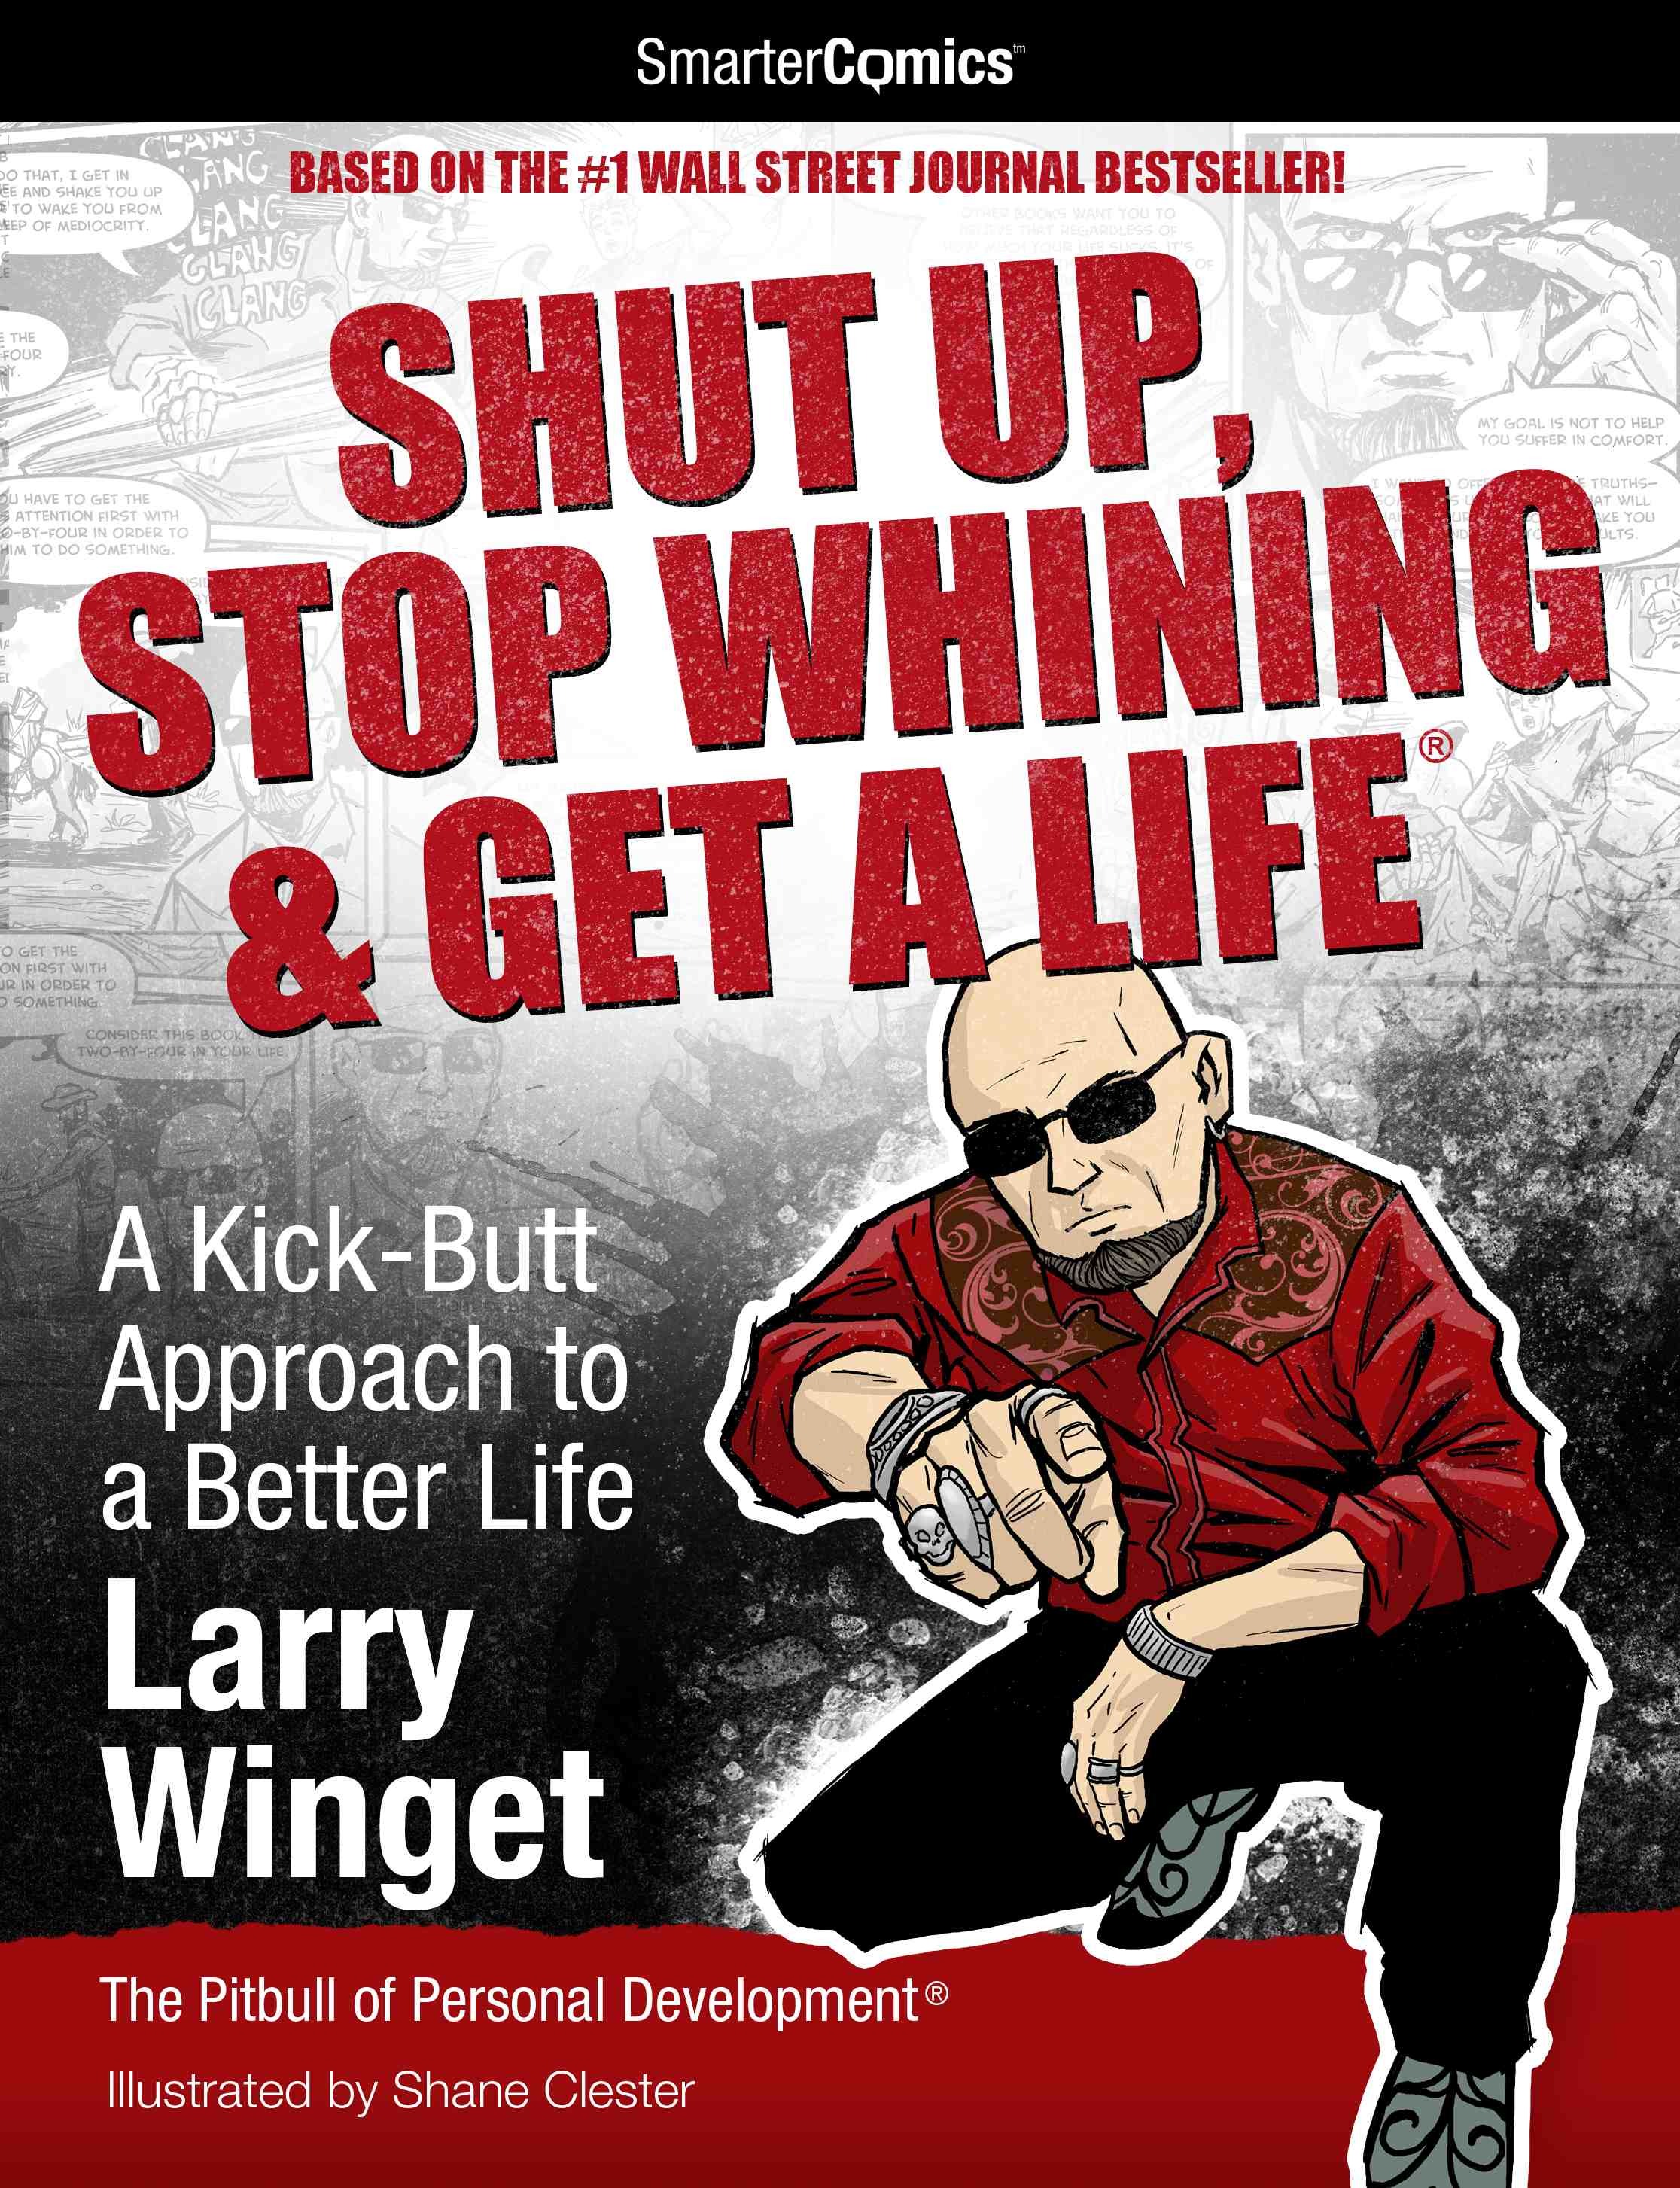 Shut Up, Stop Whining & Get a Life from SmarterComics: A Kick-Butt Approach to a Better Life